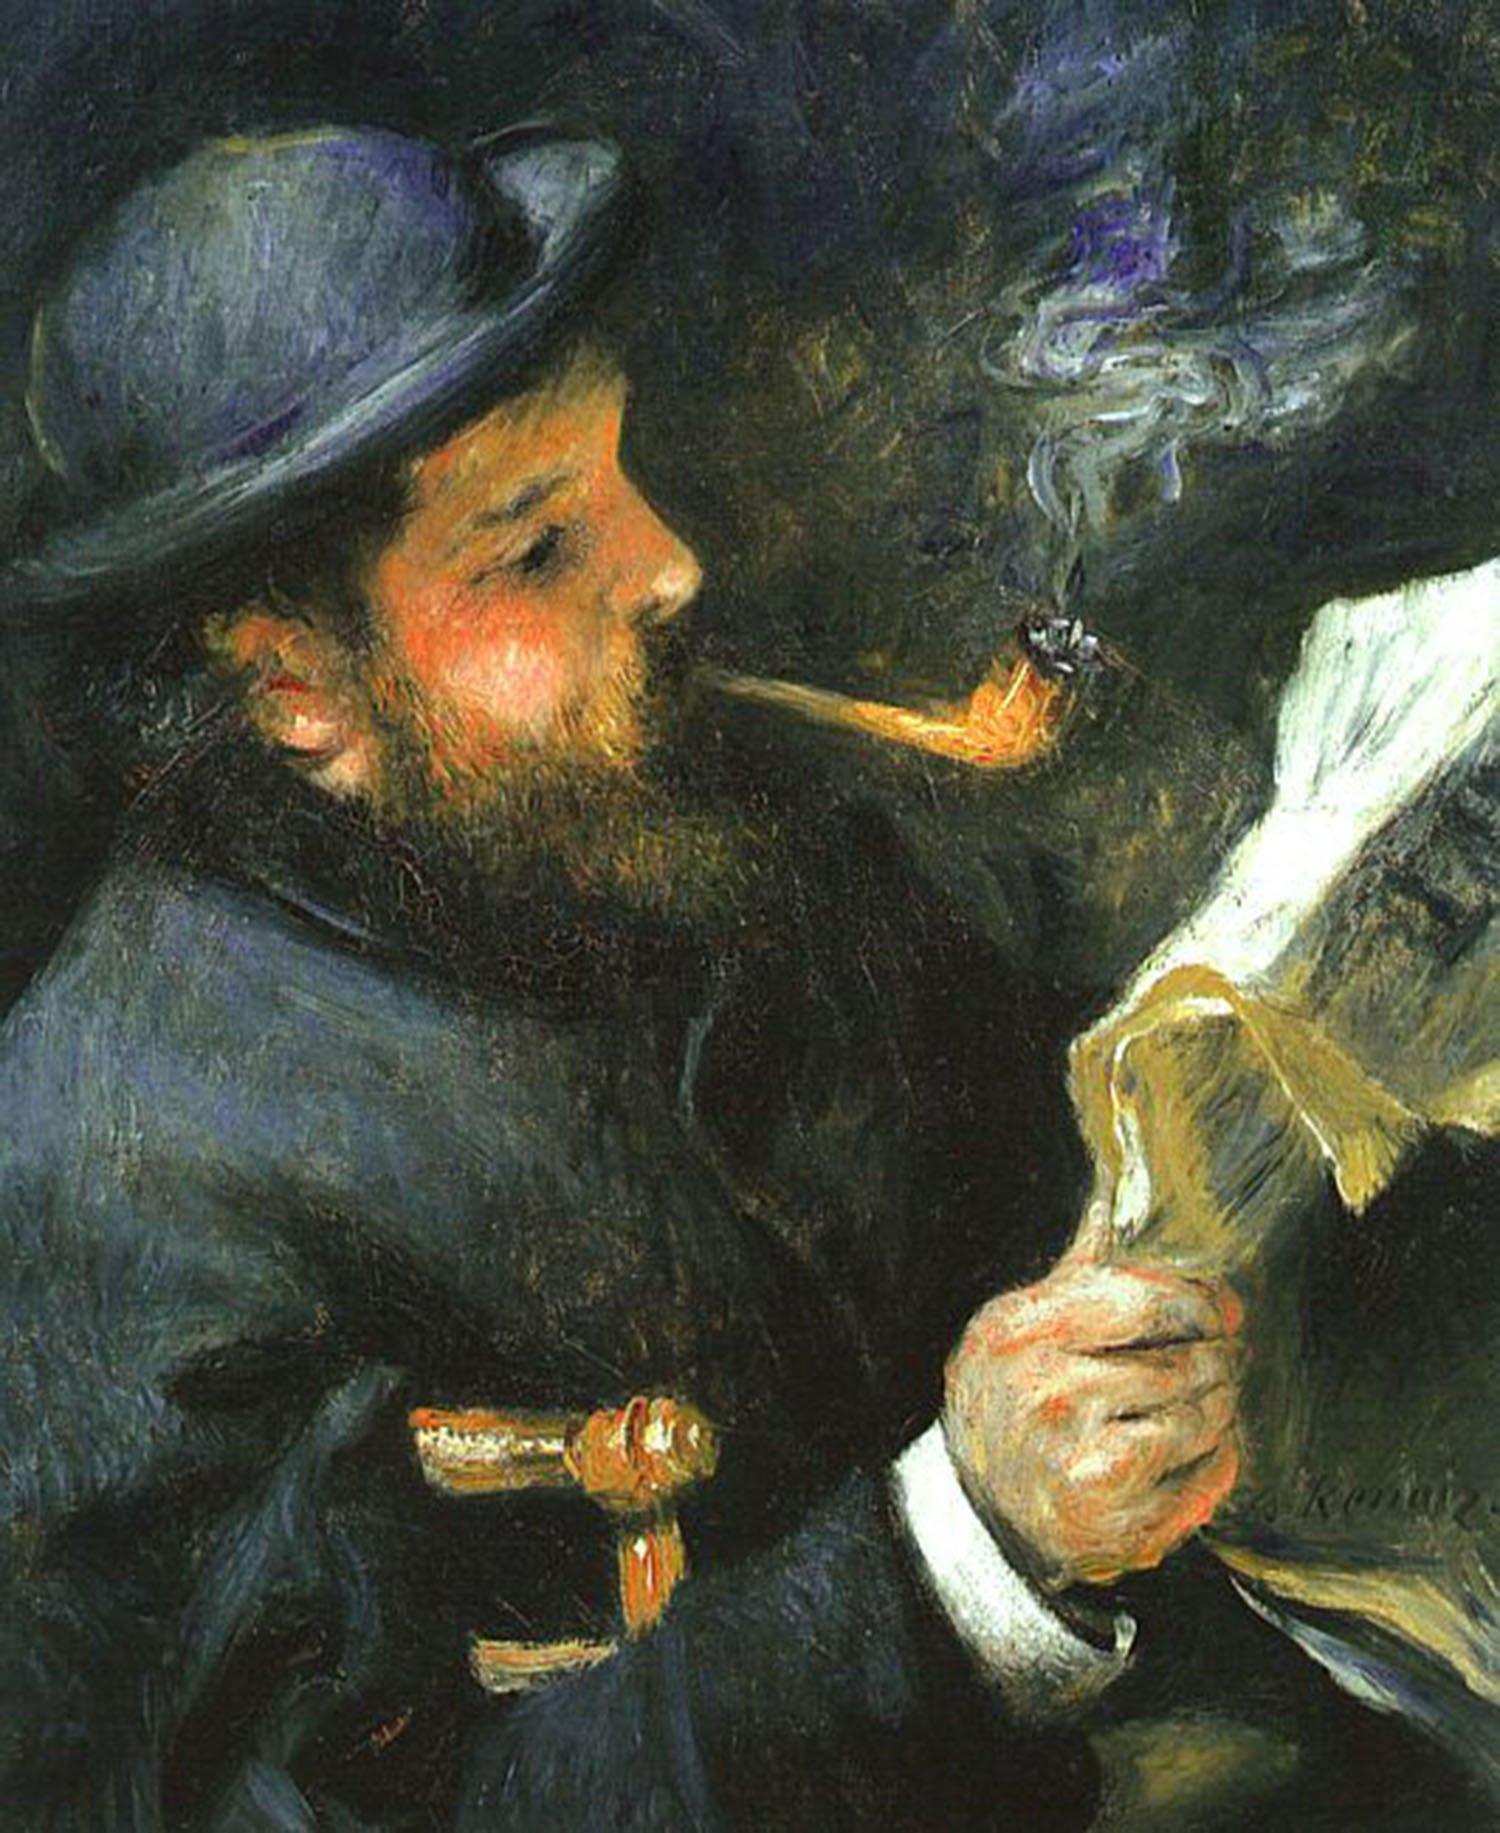 Monet che legge, 1872, Parigi, Museo Marmottan Monet